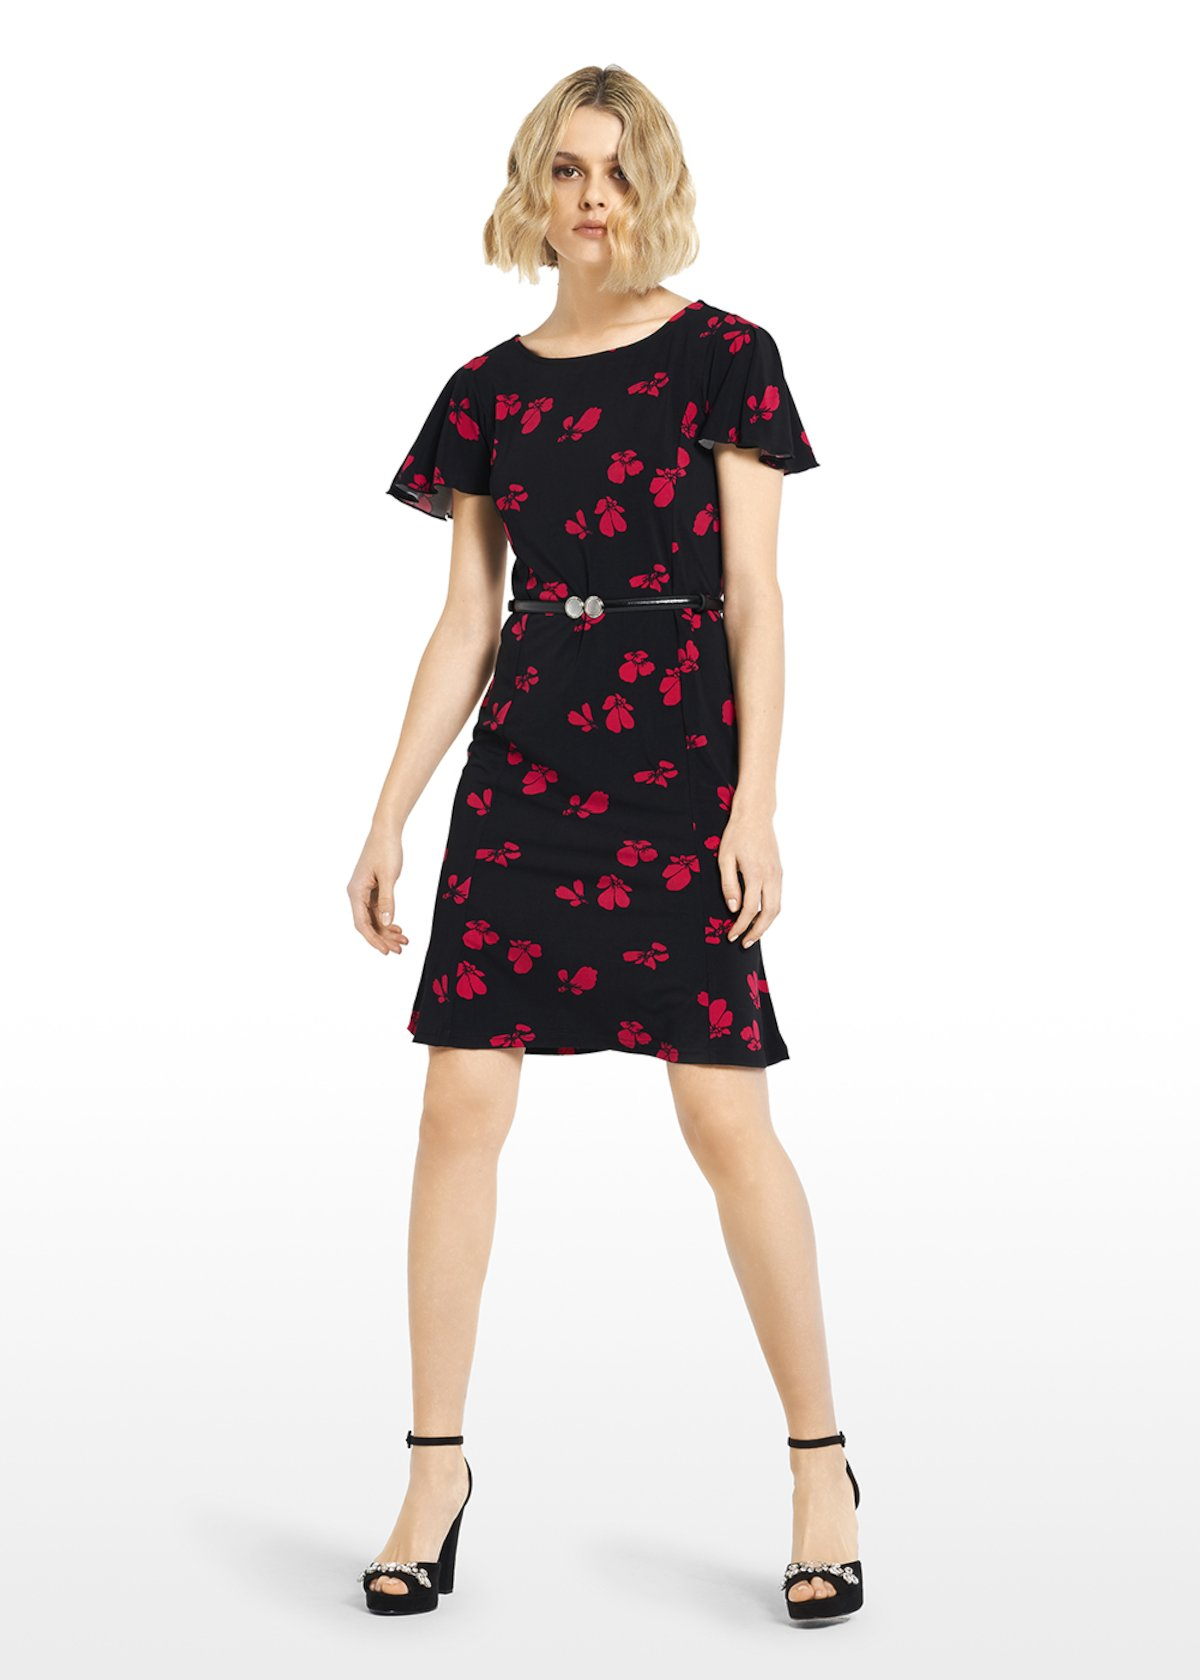 Alek jersey dress micro-flowers pattern with boat neckline - Black\ Tulipano\ Fantasia - Woman